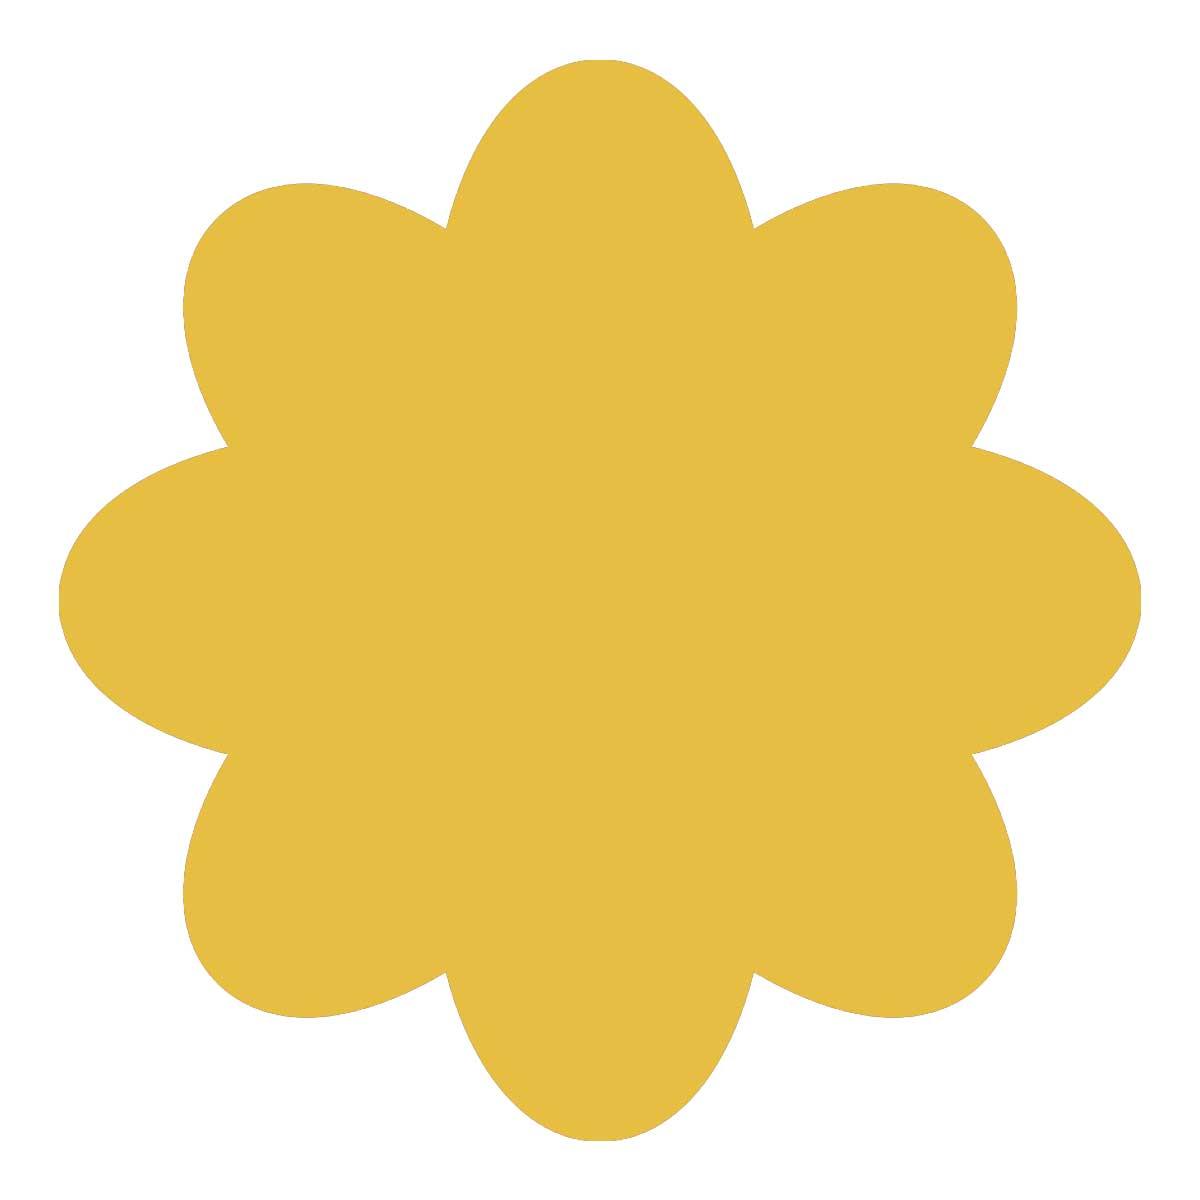 Delta Ceramcoat ® Acrylic Paint - Sunshine Pearl, 2 oz. - 026150202W